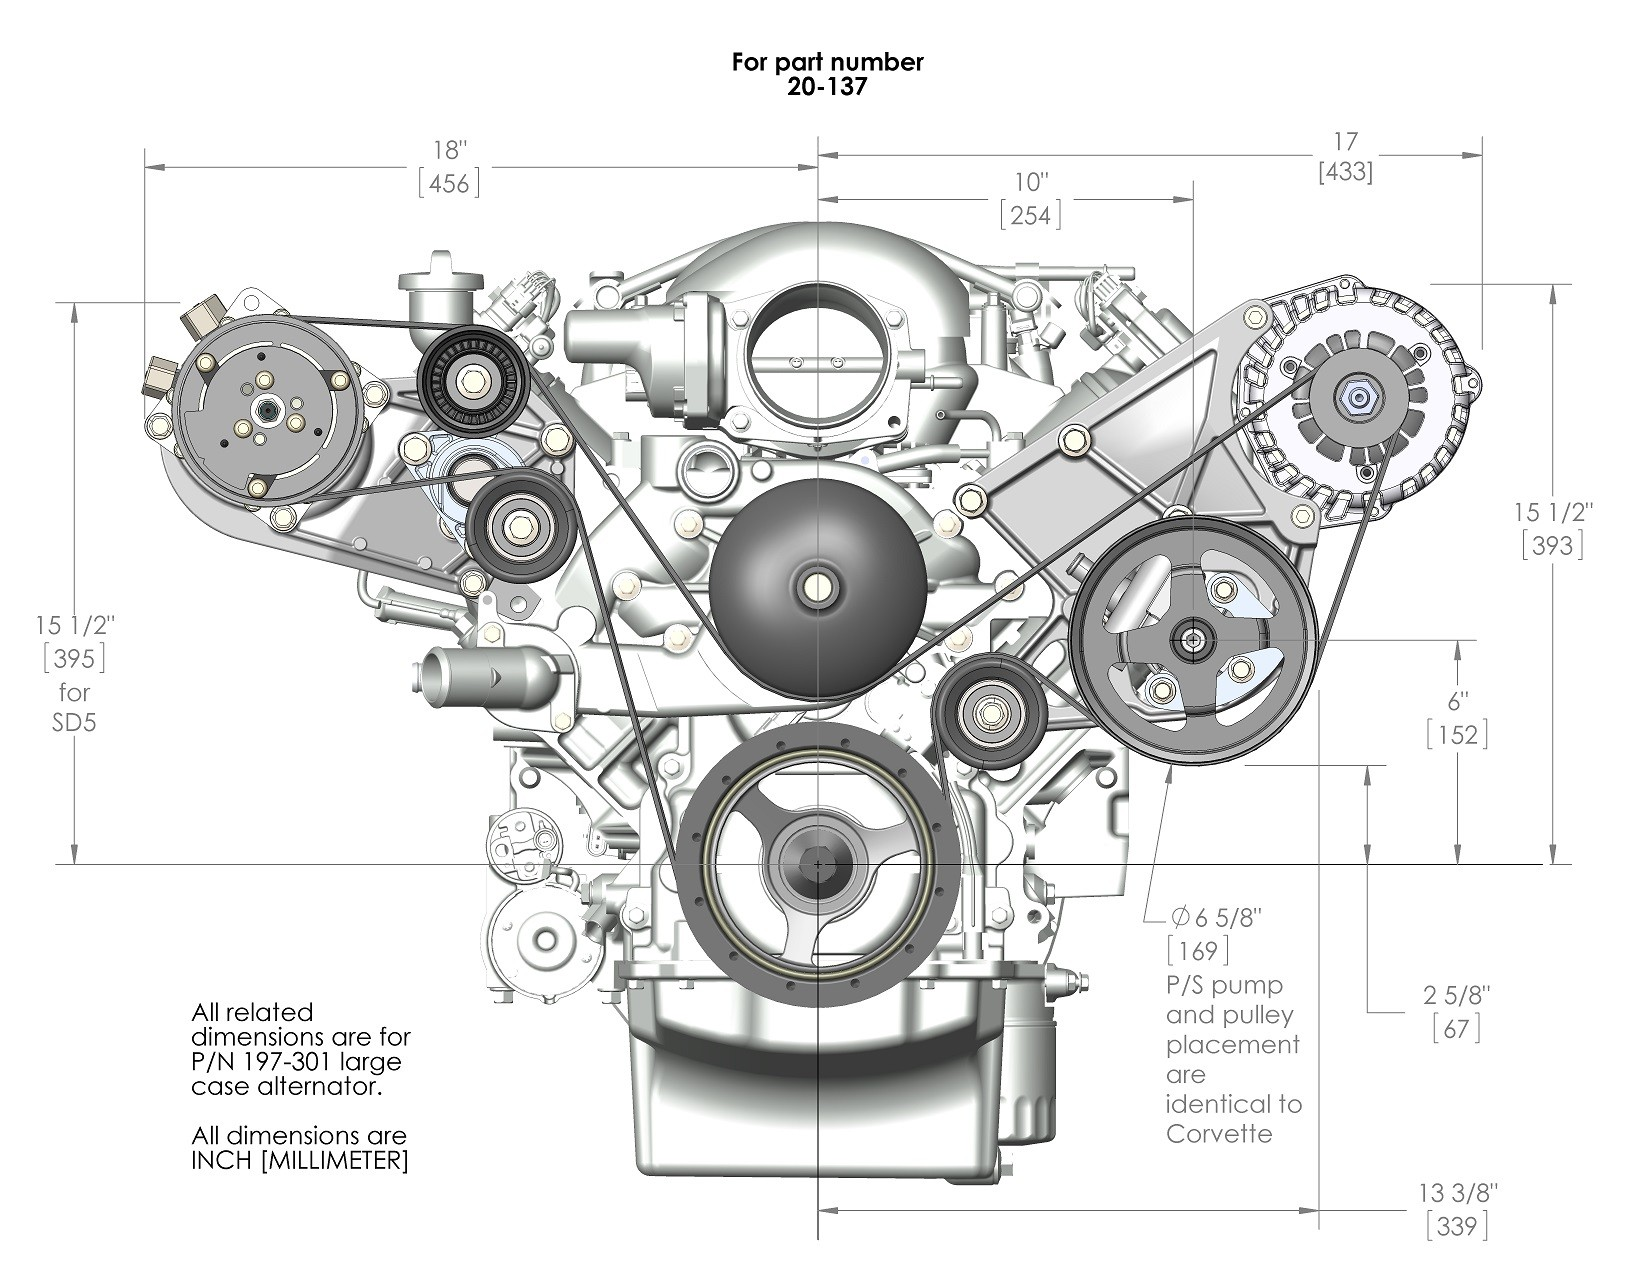 Chrysler 3 8 Engine Diagram 20 137 Dimensions1 1650—1275 Ls Engines Pinterest Of Chrysler 3 8 Engine Diagram